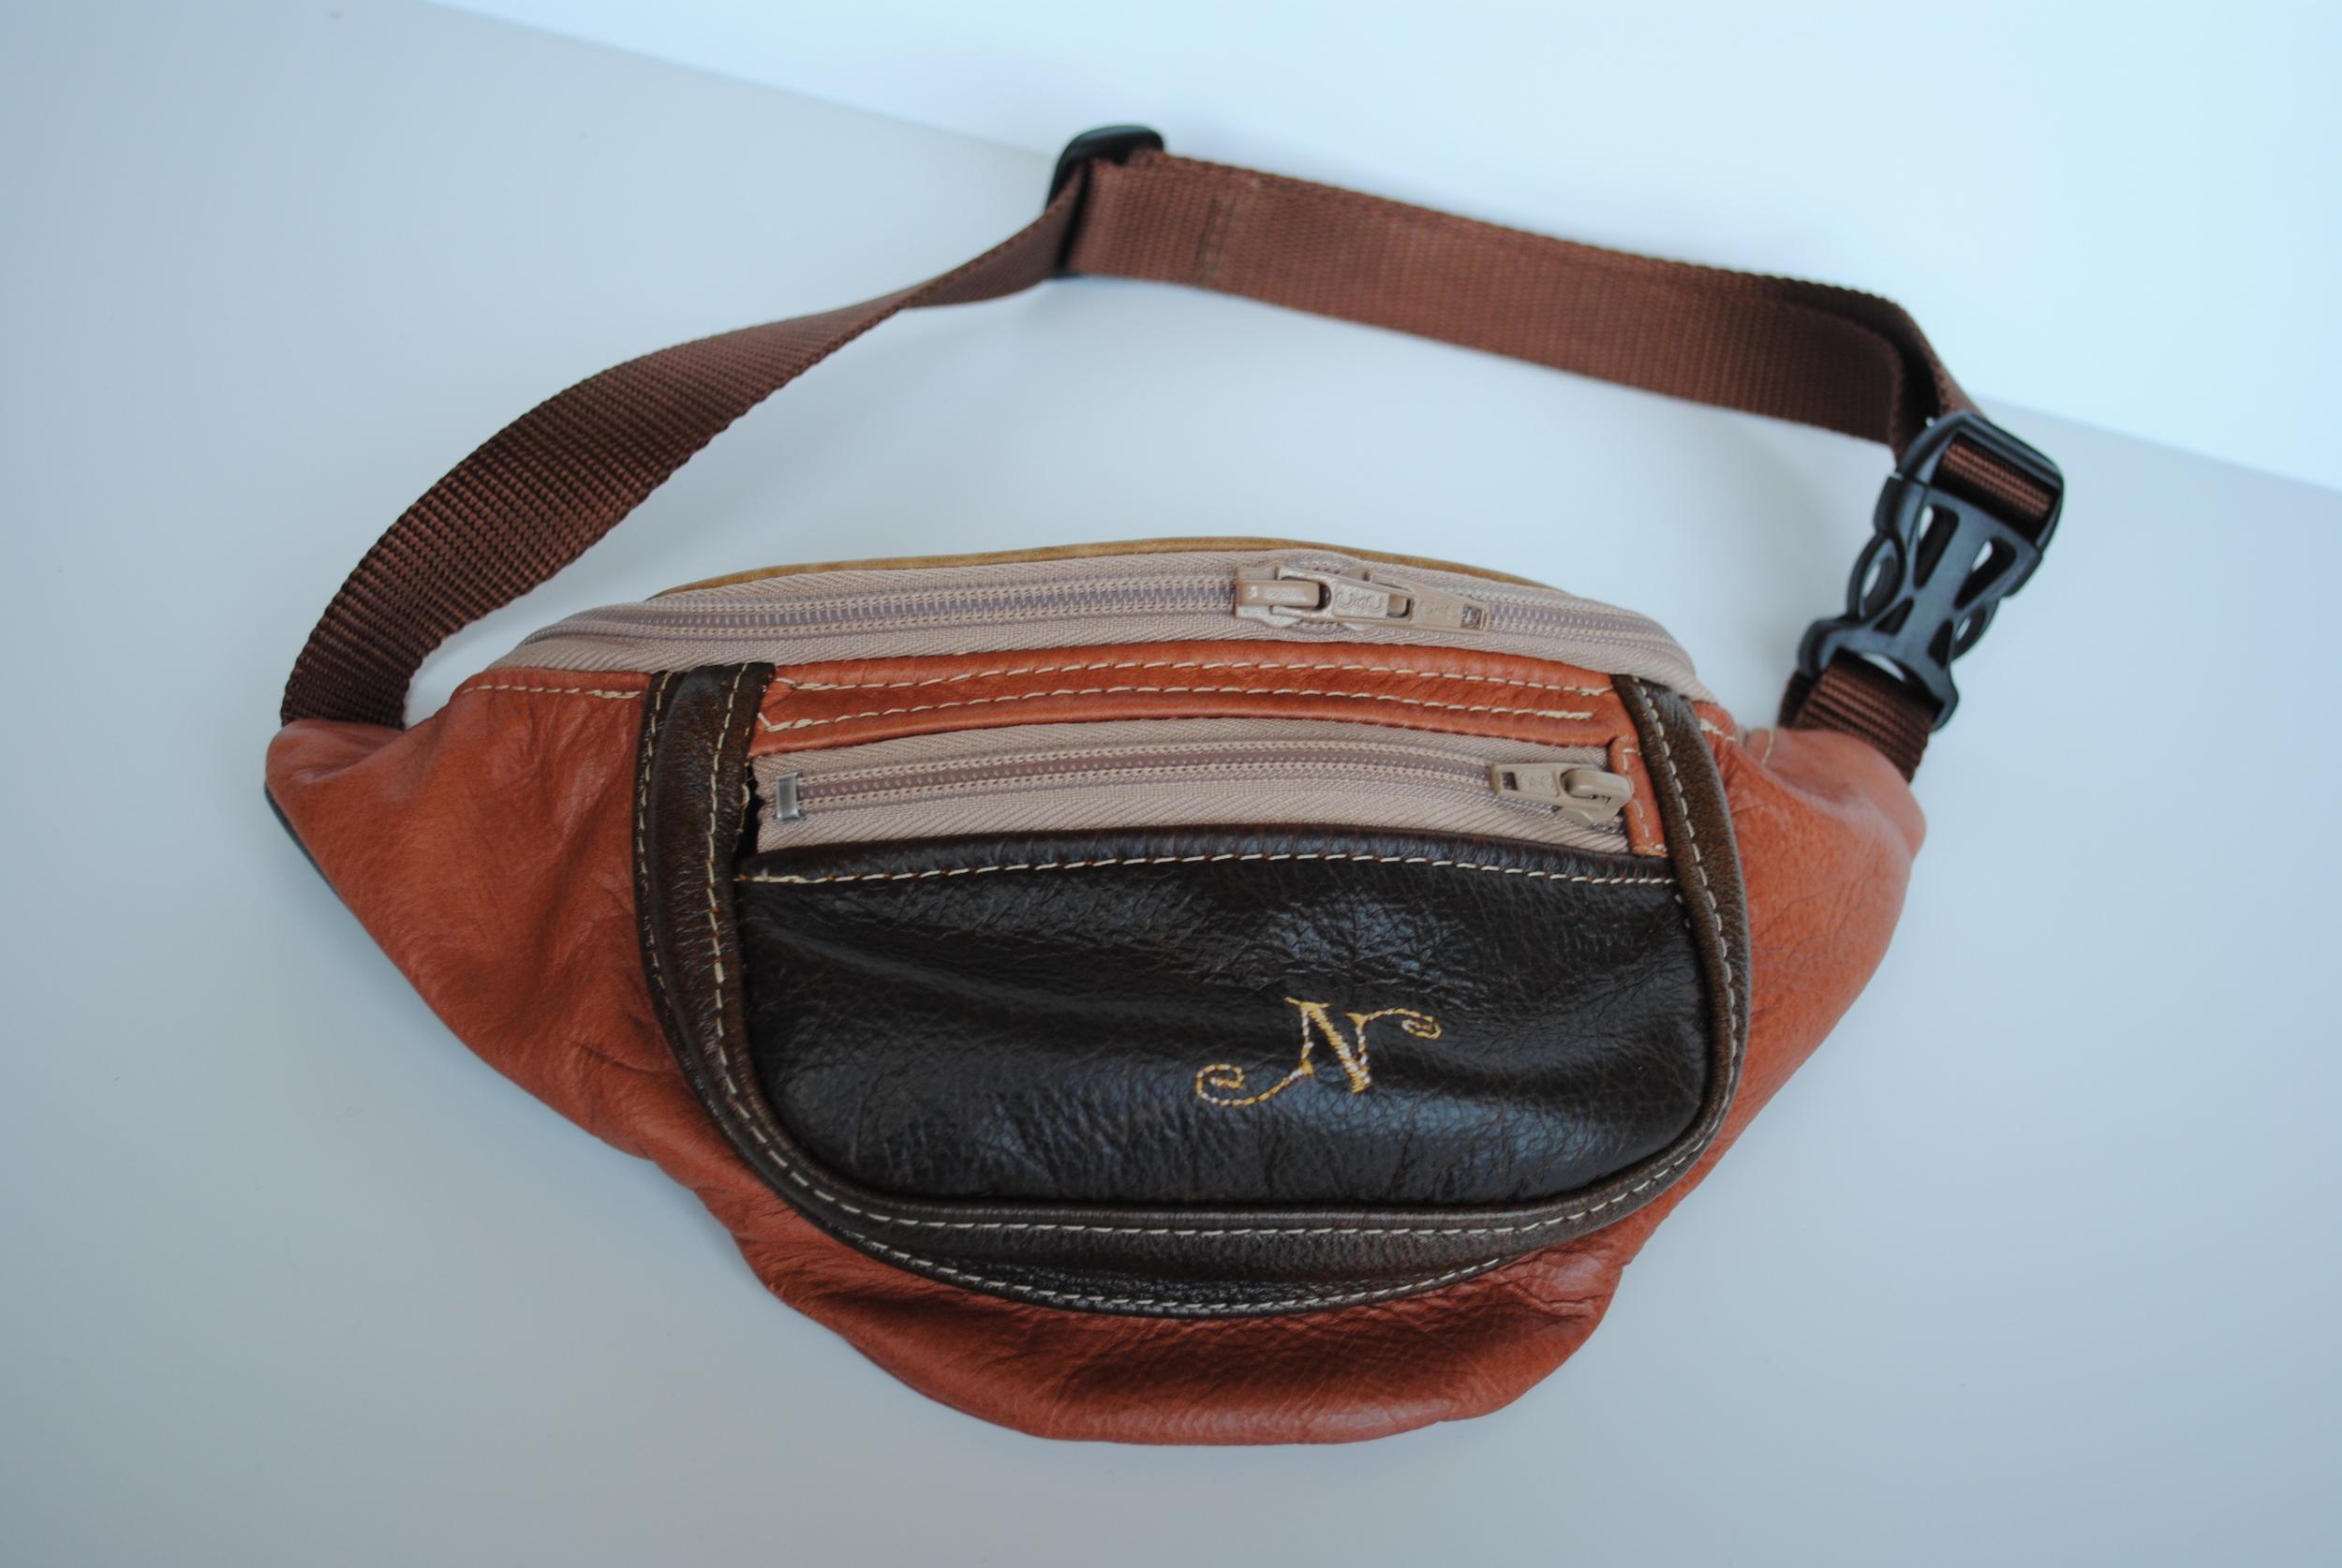 Sedona Waist Bag with 3 zippered pockets